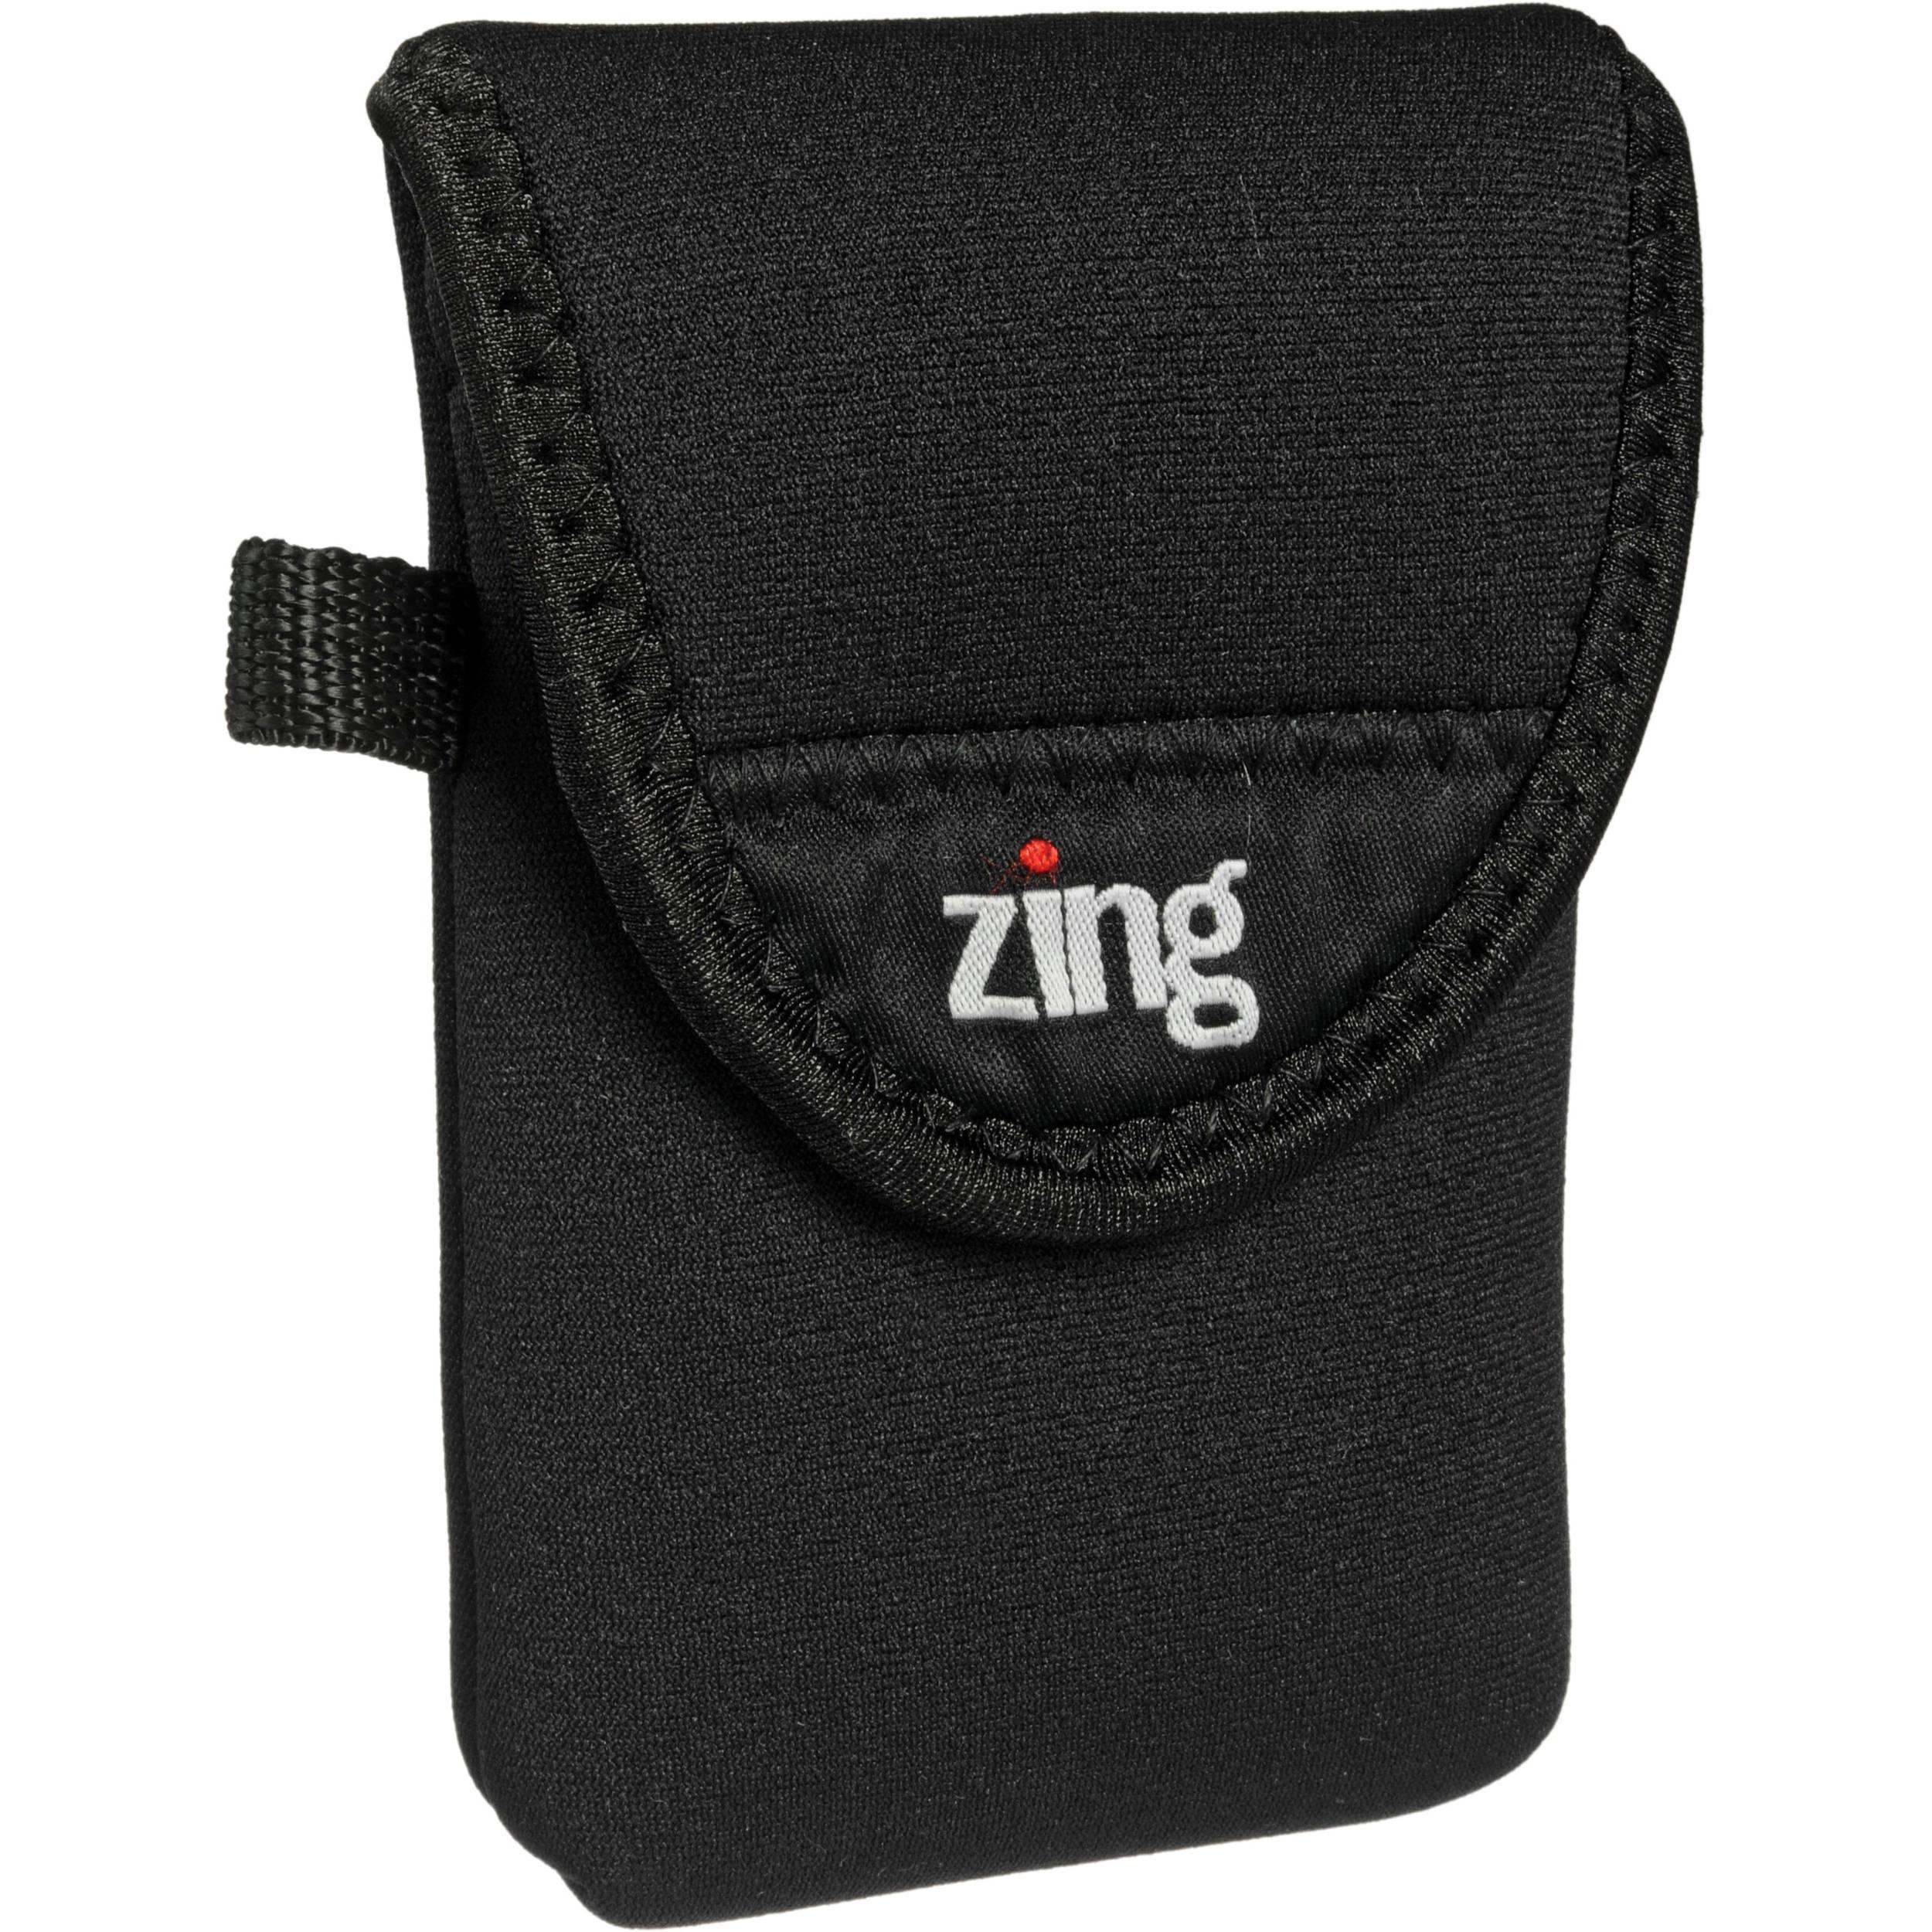 zing camera case